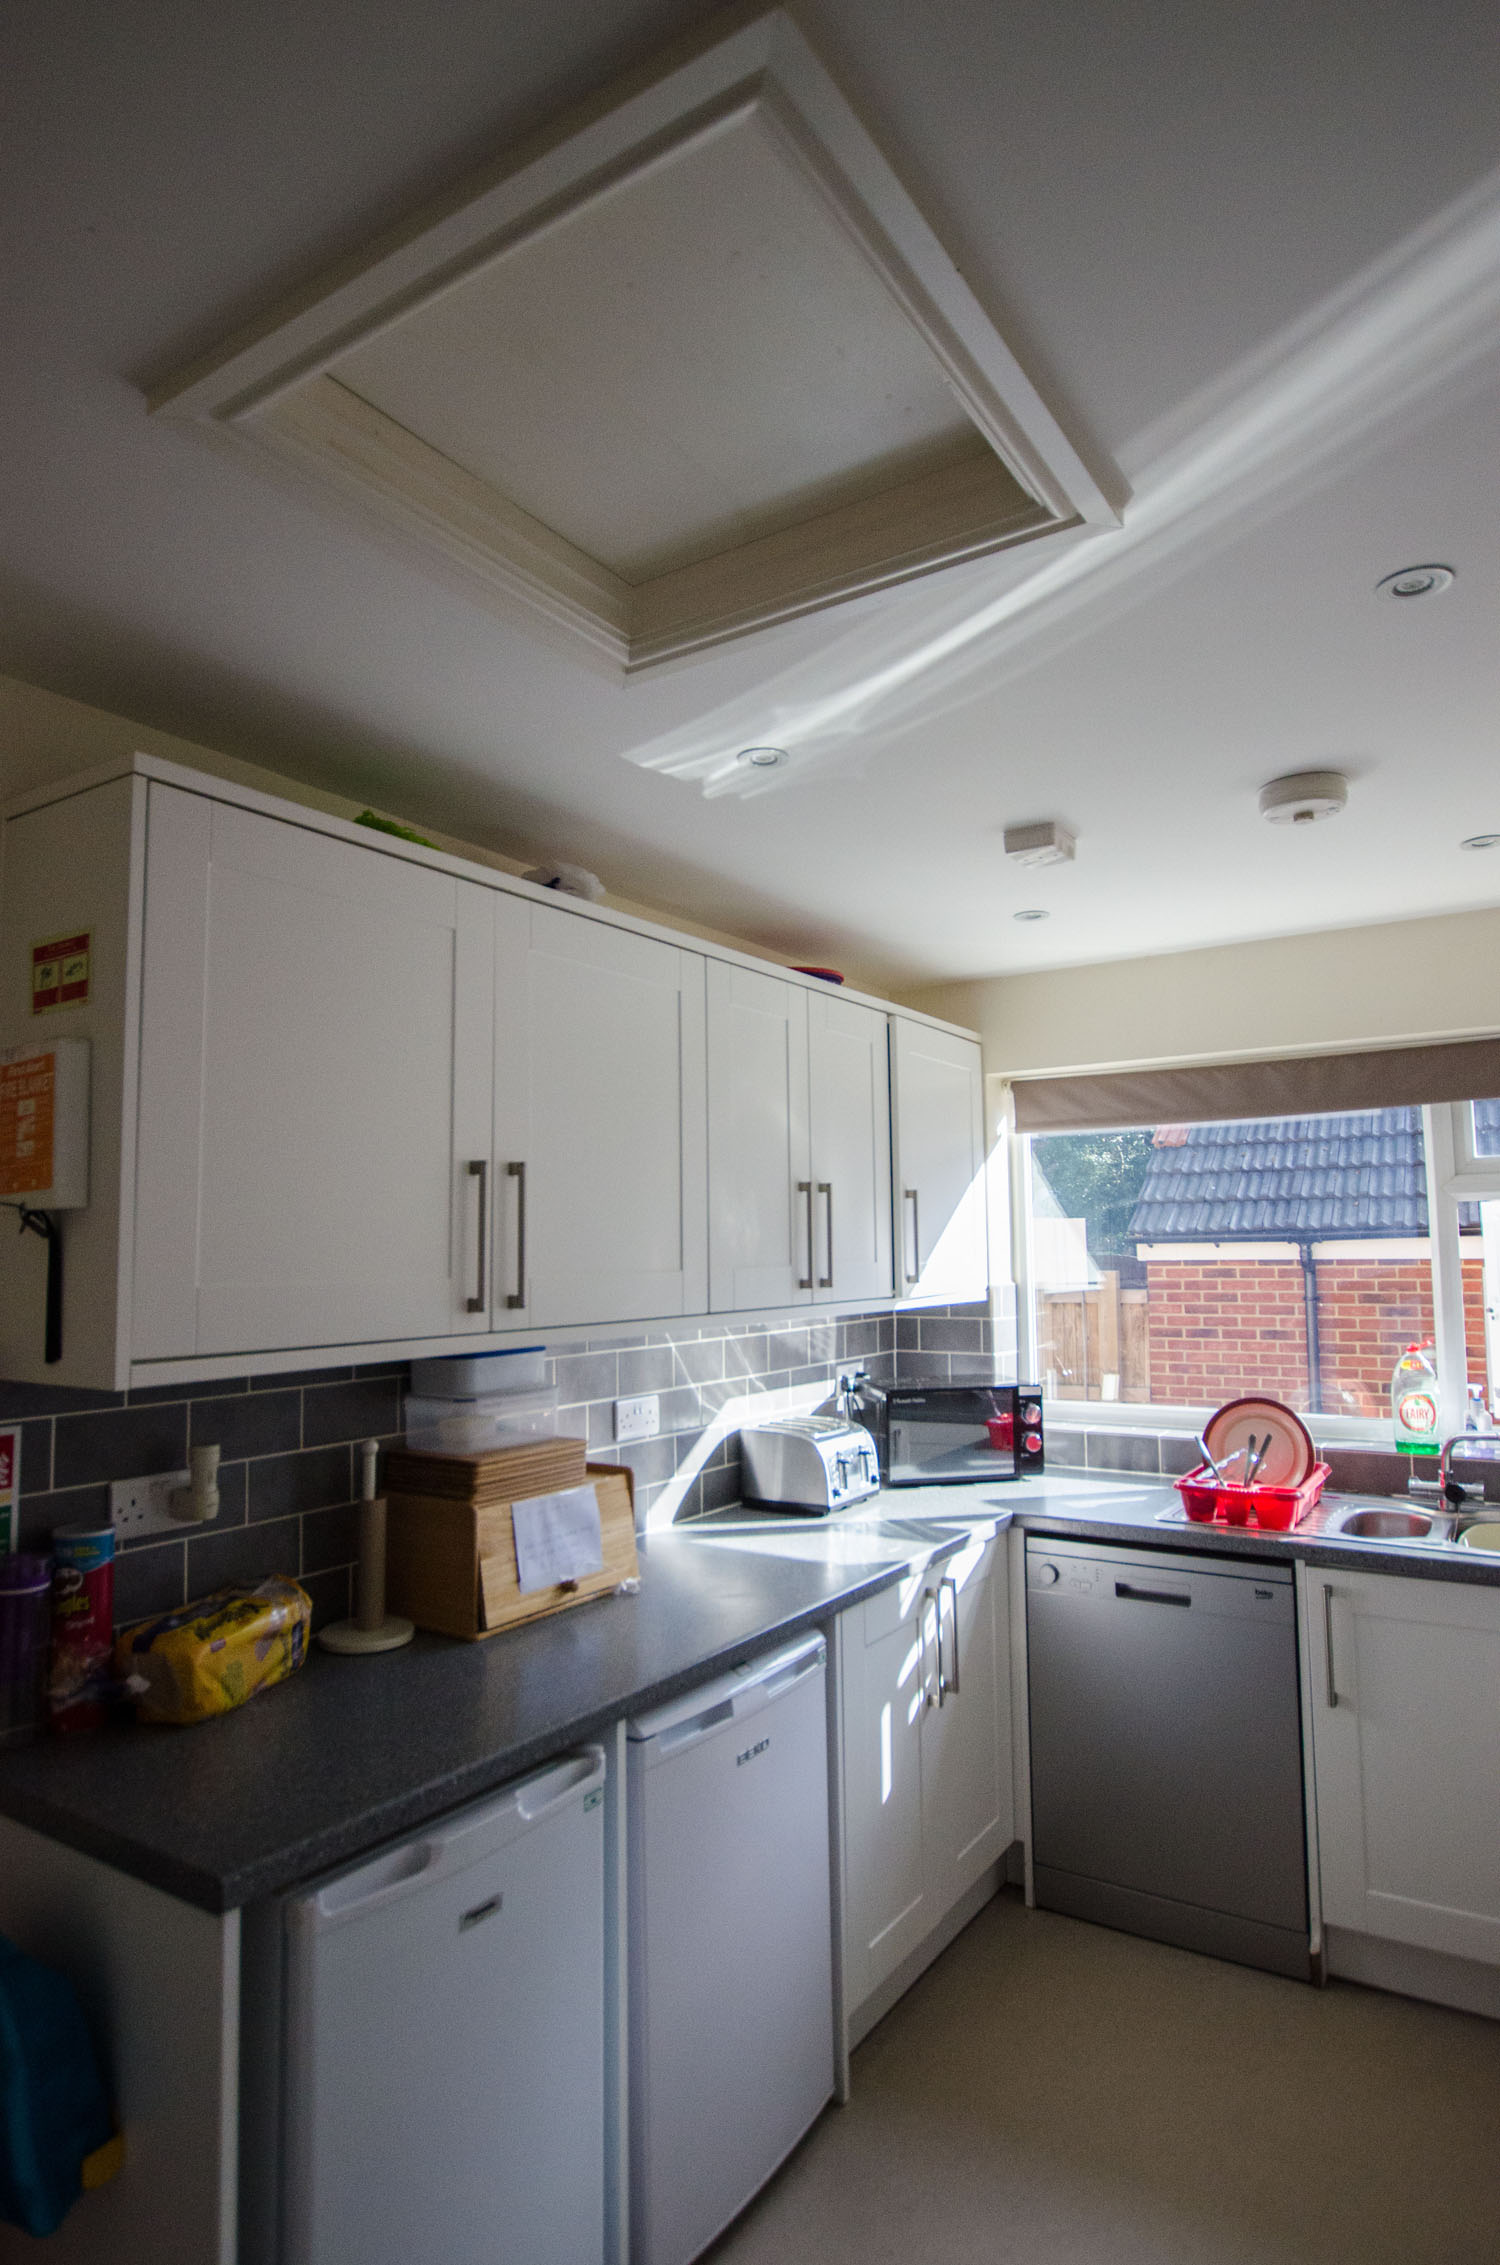 Abbey kitchen 1